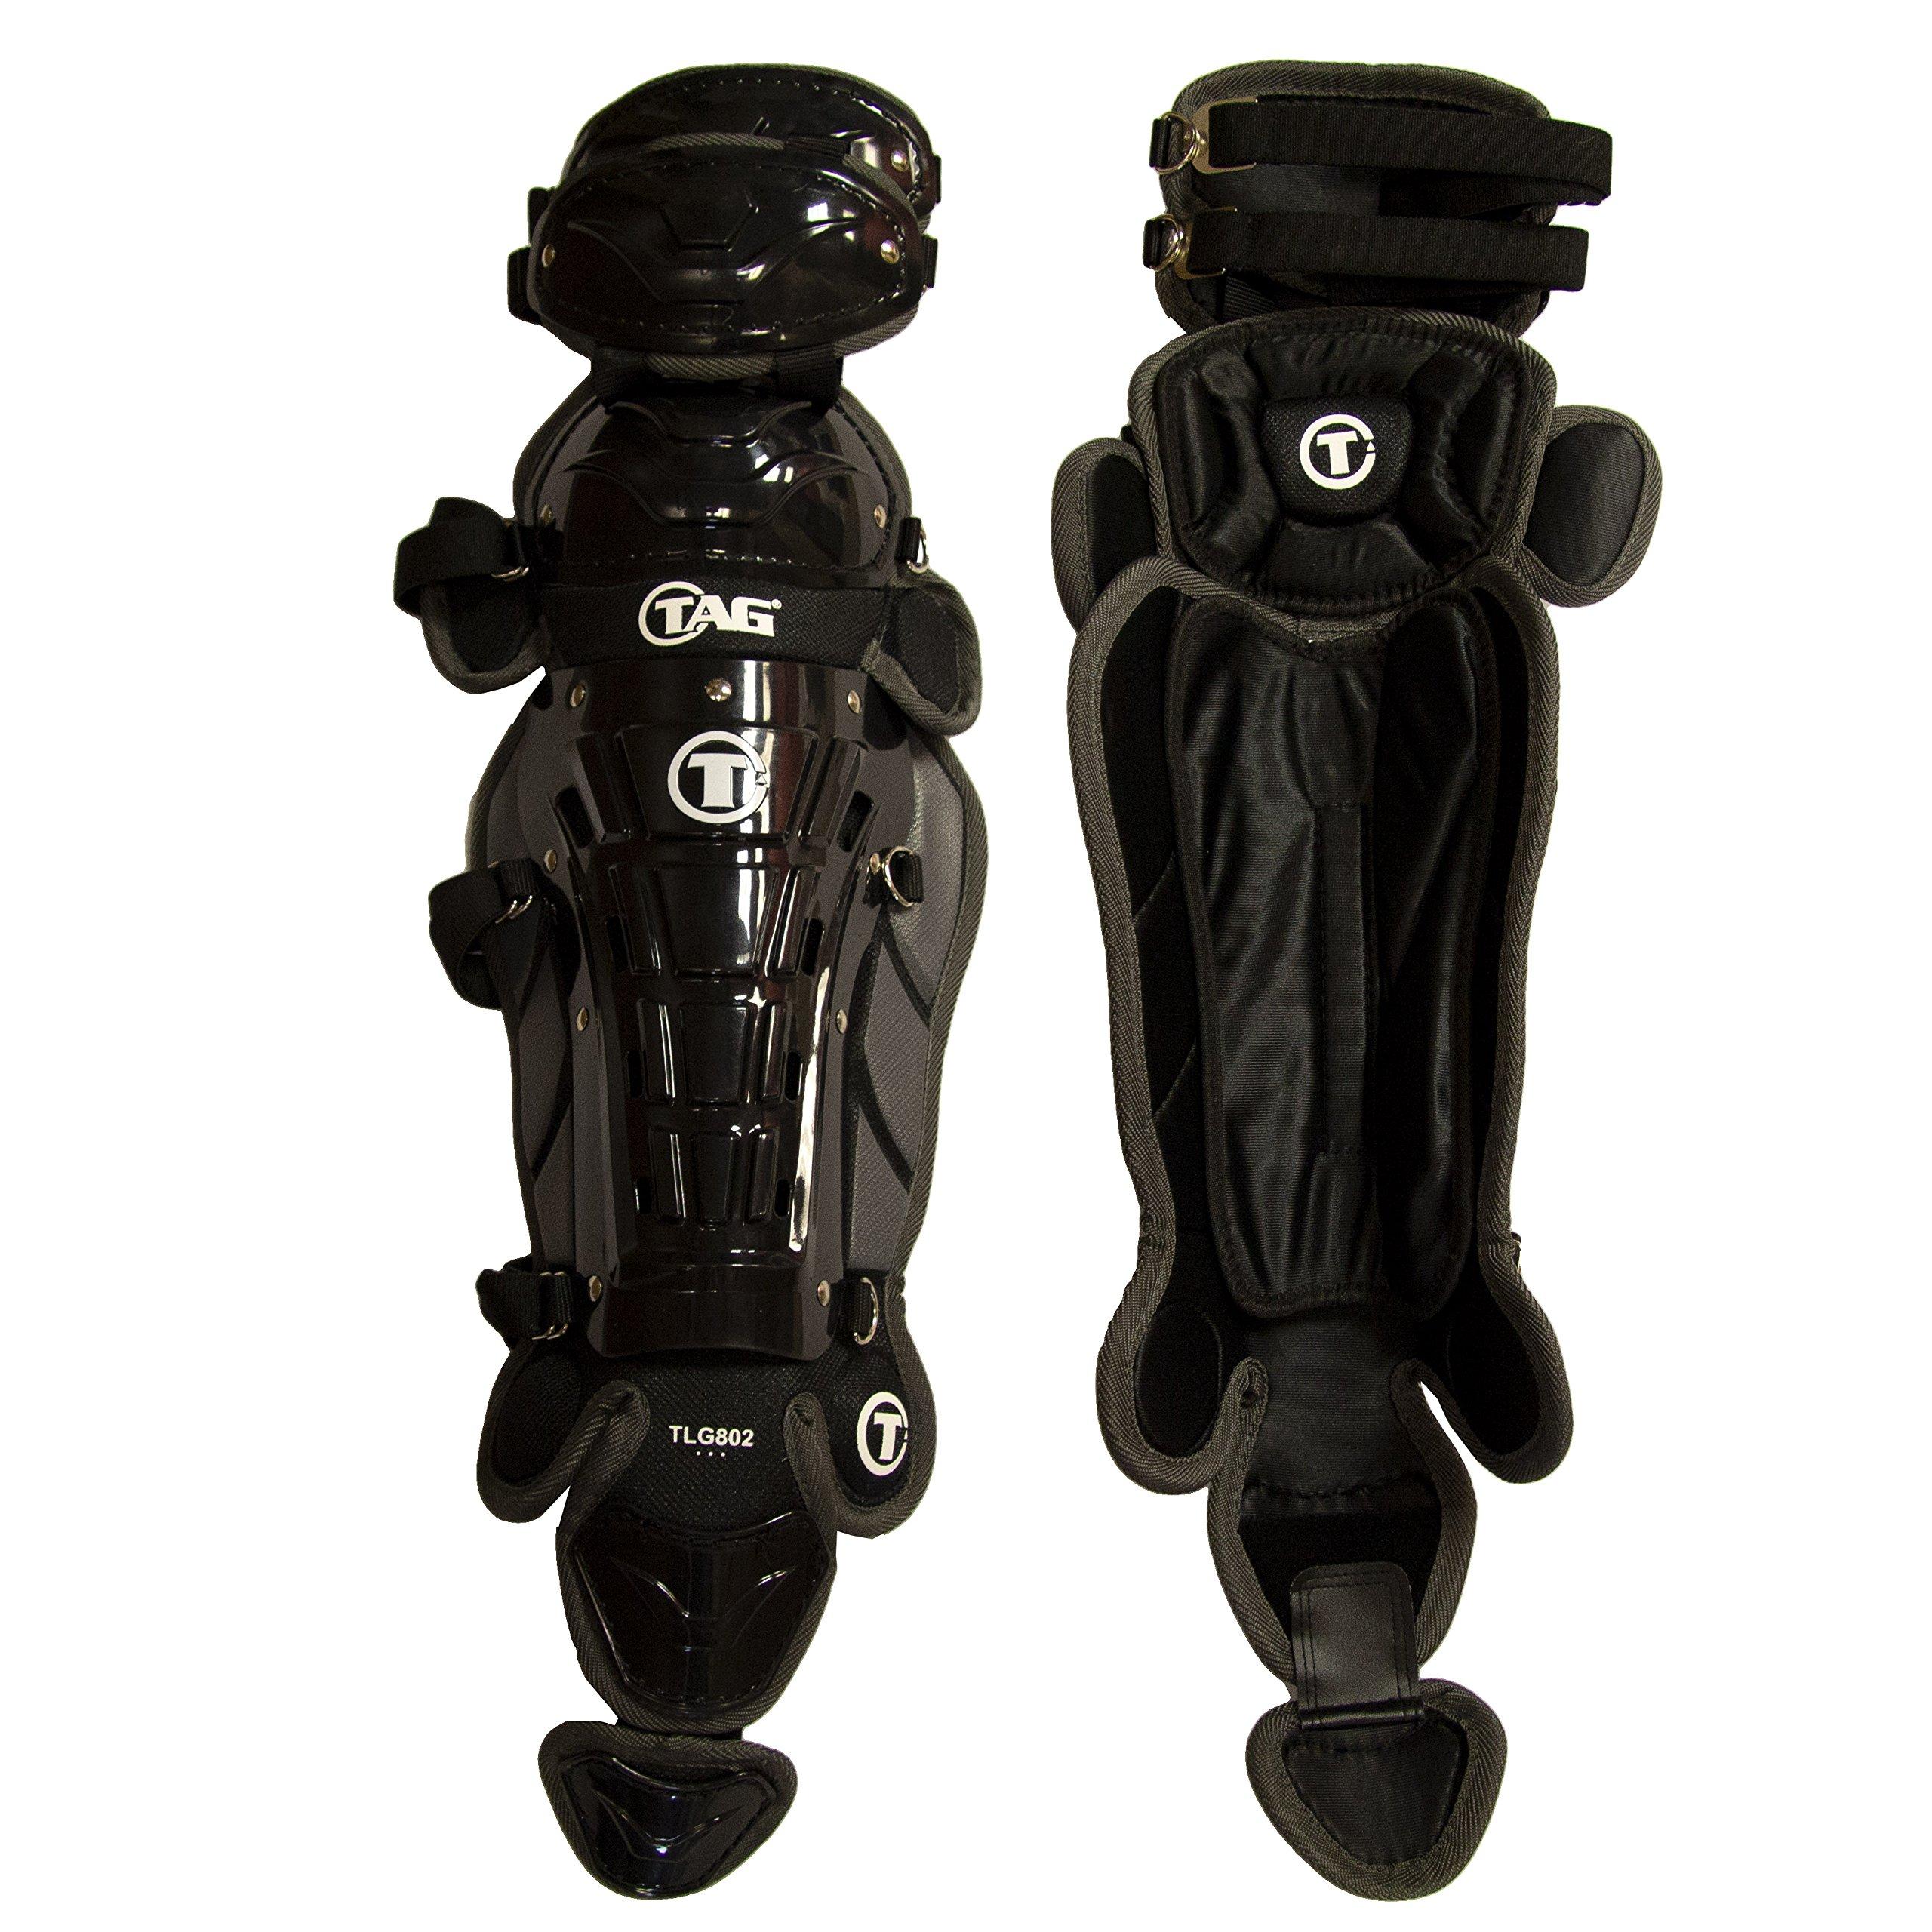 TAG 16'' Pro Series Women's Leg Guard, Black/Grey by TAG